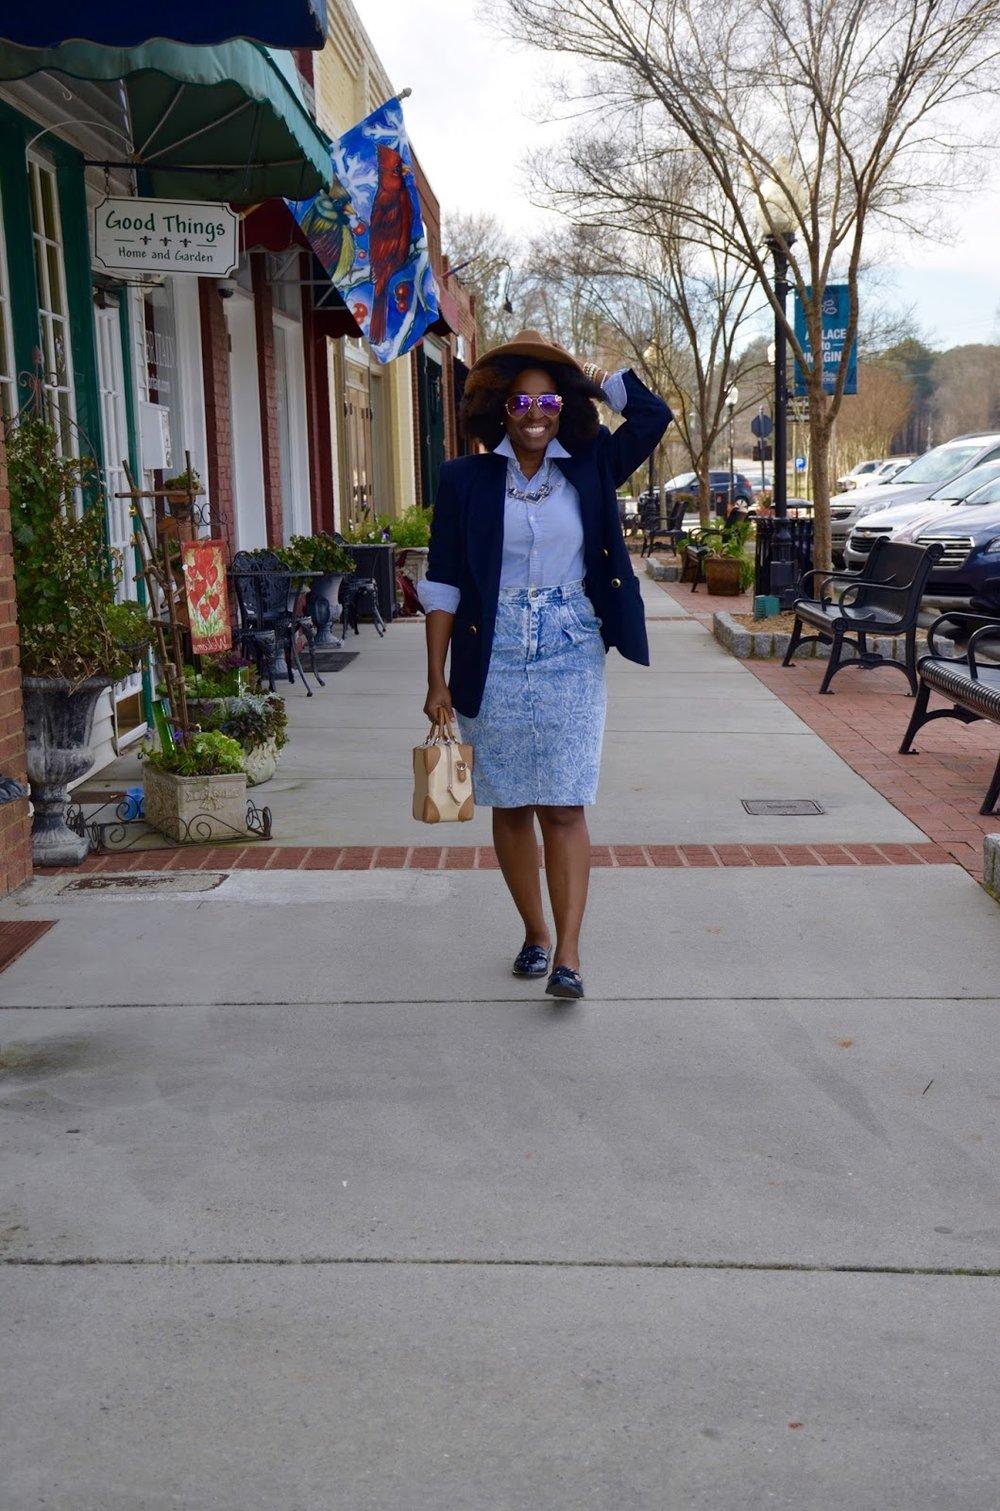 Atlanta blogger, Atlanta style blogger, style blogger, black blogger, vintage stone wash skirt, vintage style, vintage blazer, blue oxfords, street style, street fashion, black girls killing it, retro look, trendy looks